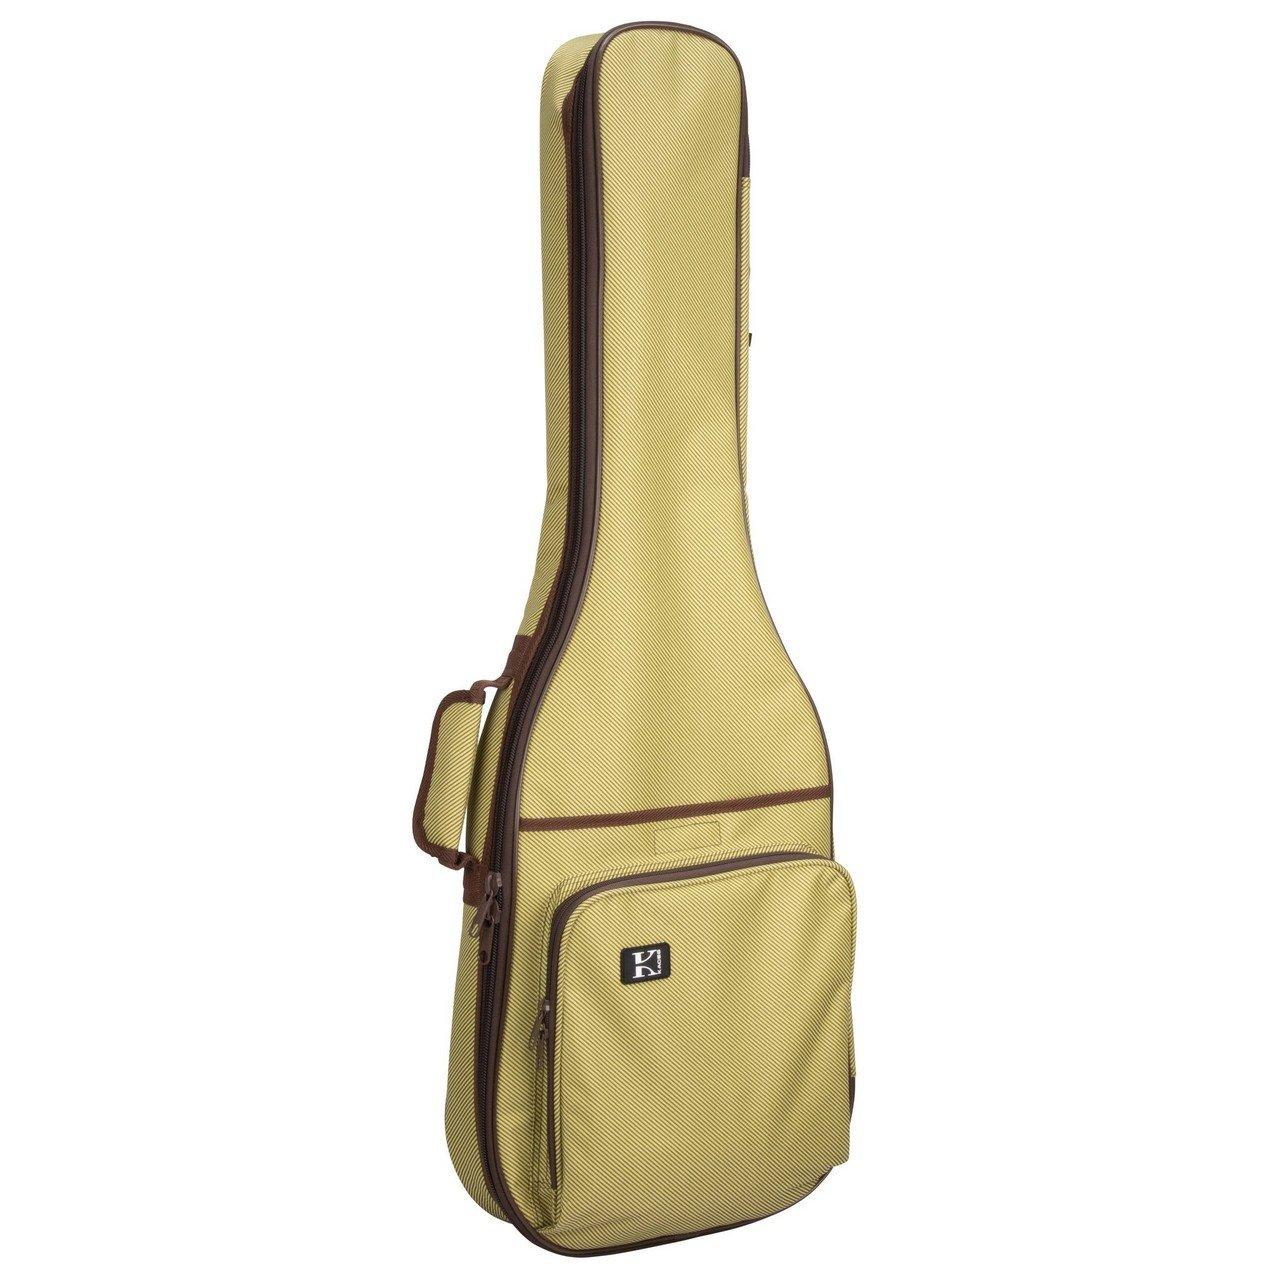 Kaces KQE-107TWD GigPak Electric Guitar Bag, Tweed